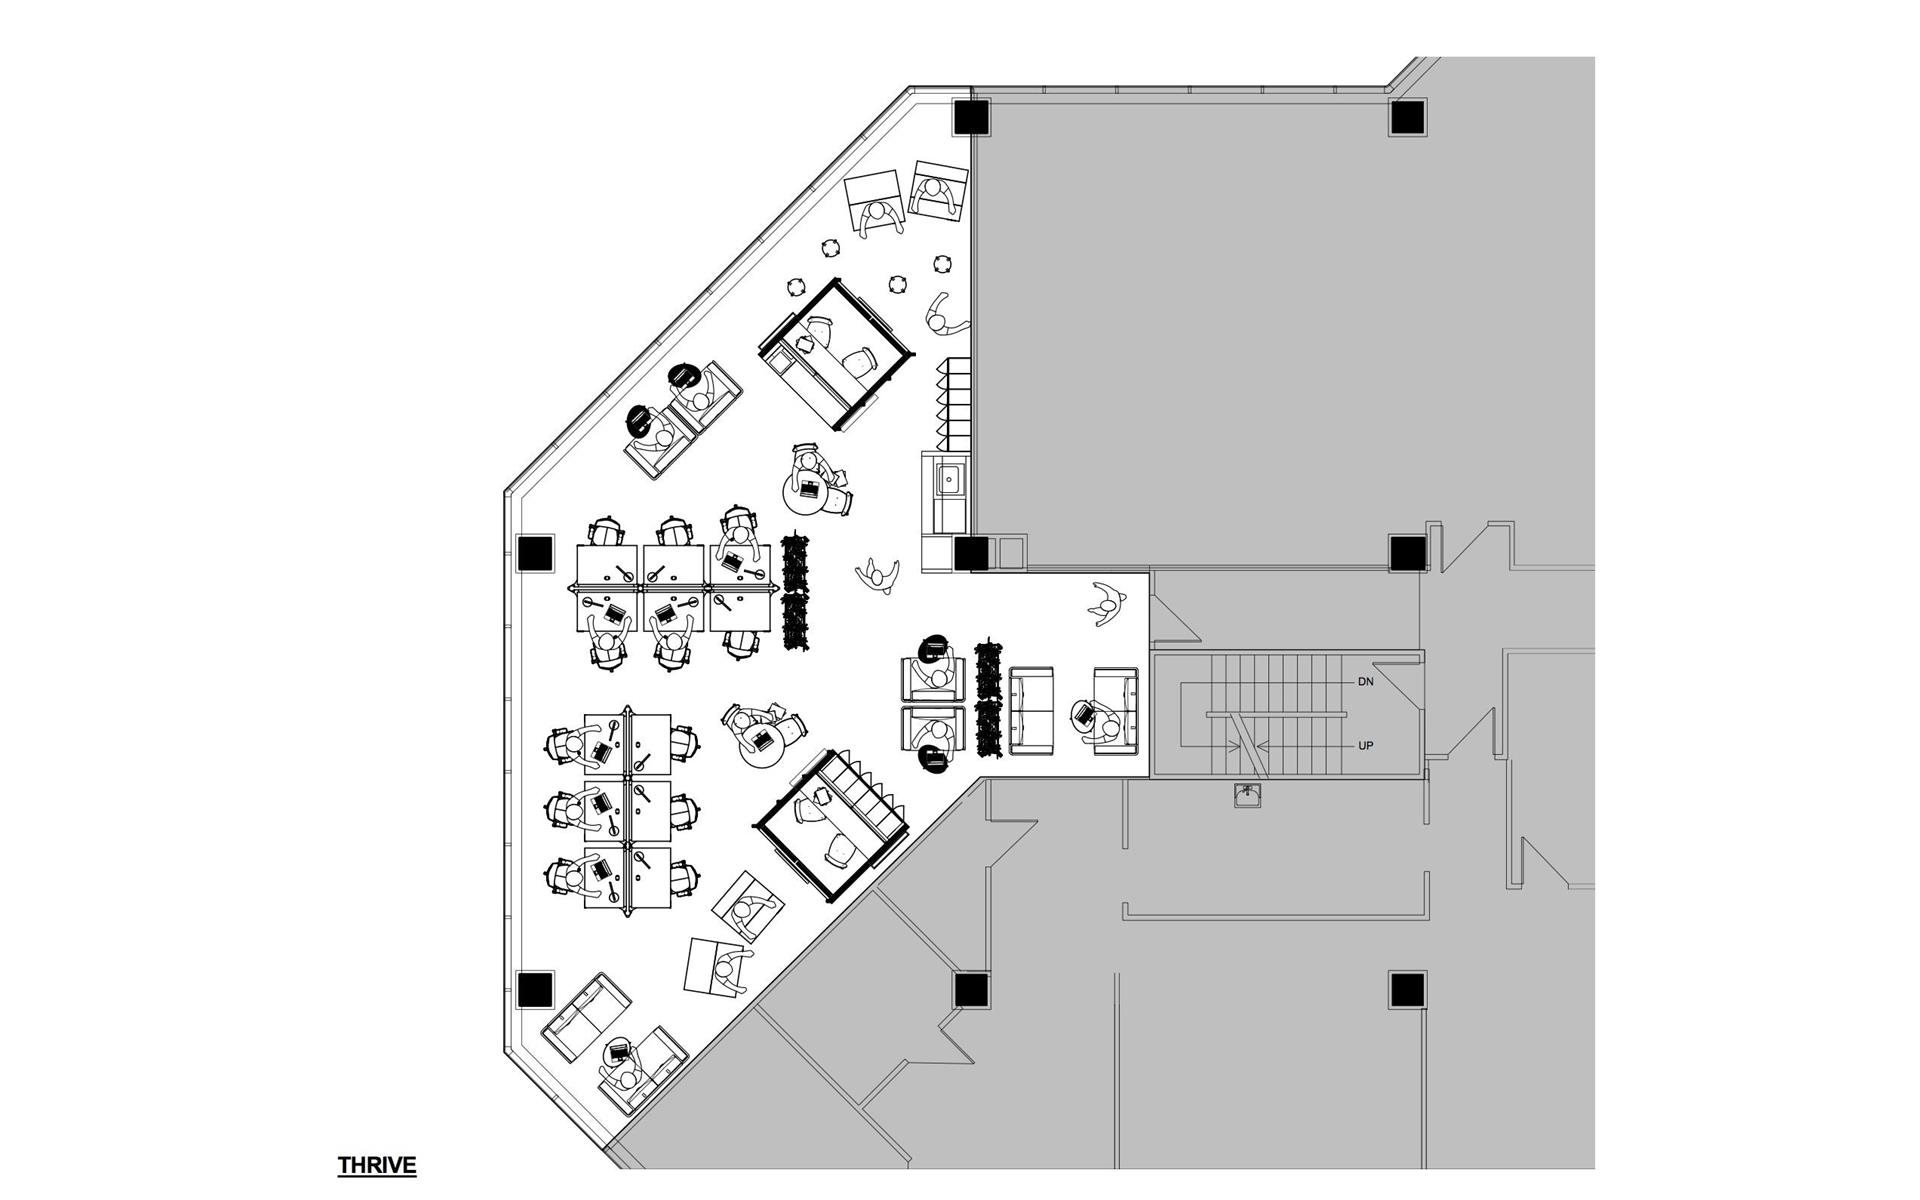 WashingtonREIT | Fairgate at Ballston - altSpace Thrive  | Suite 650